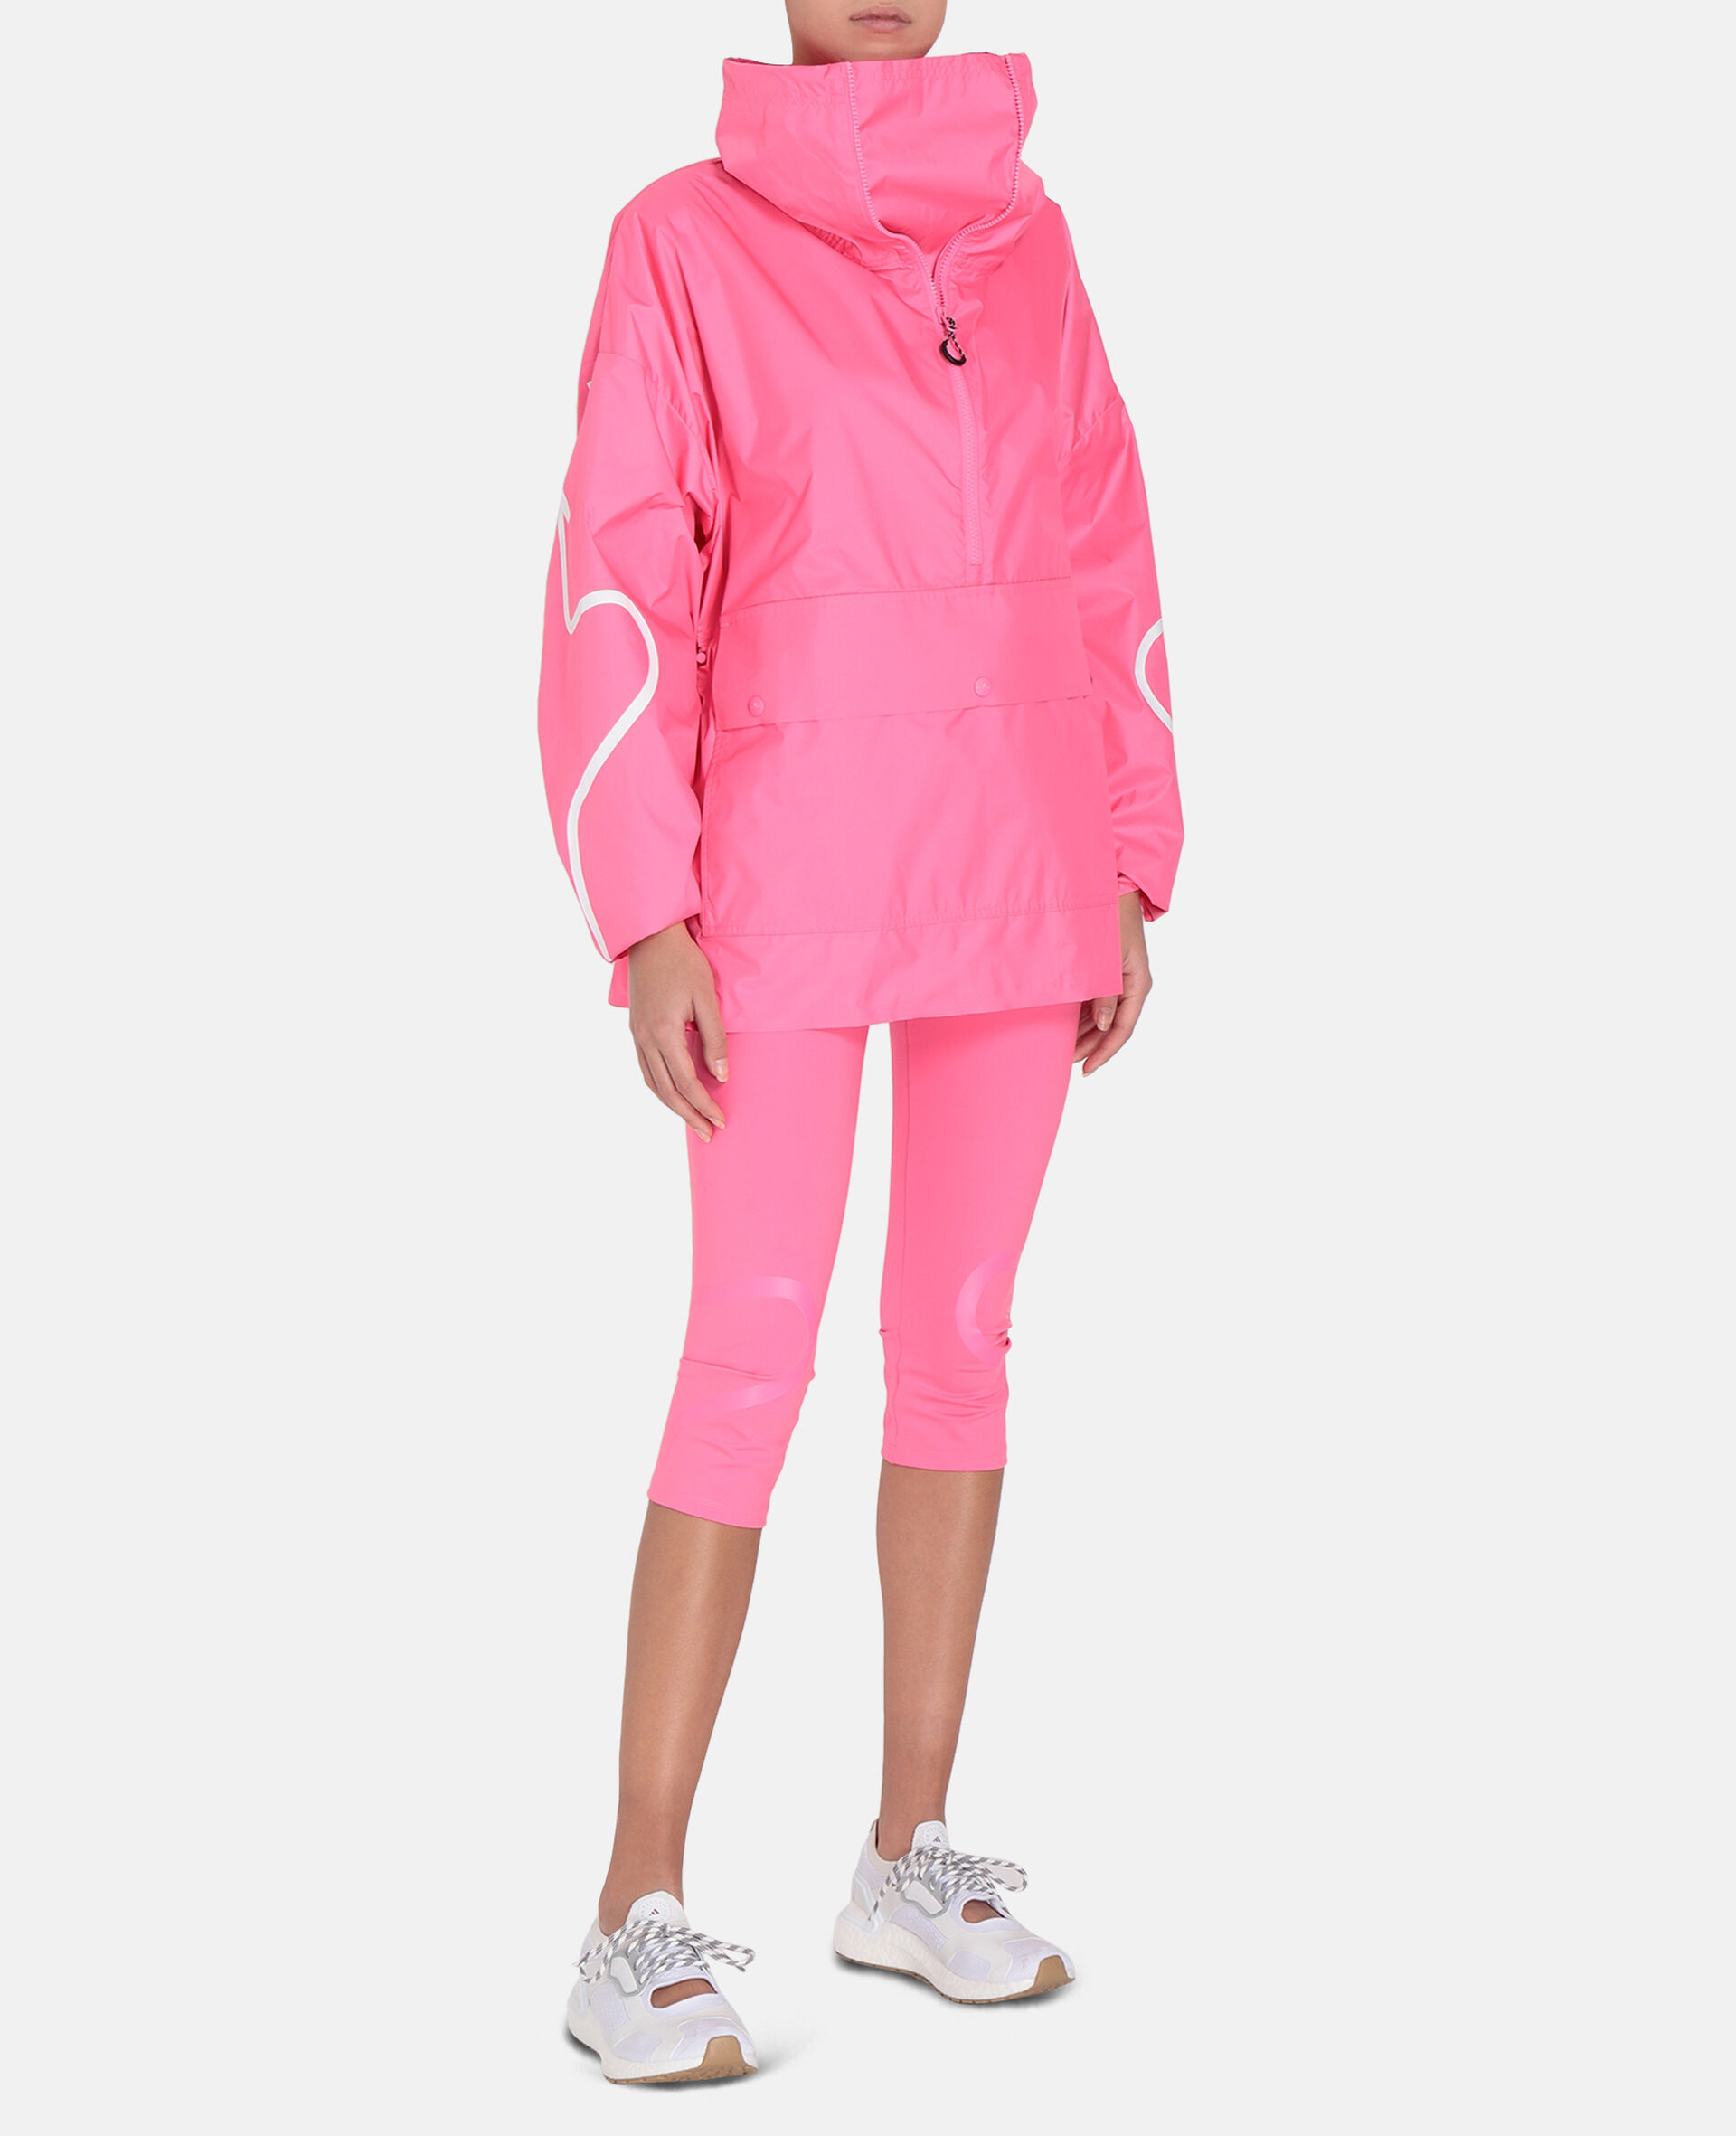 Pink Half-Zip Jacket-Pink-large image number 1